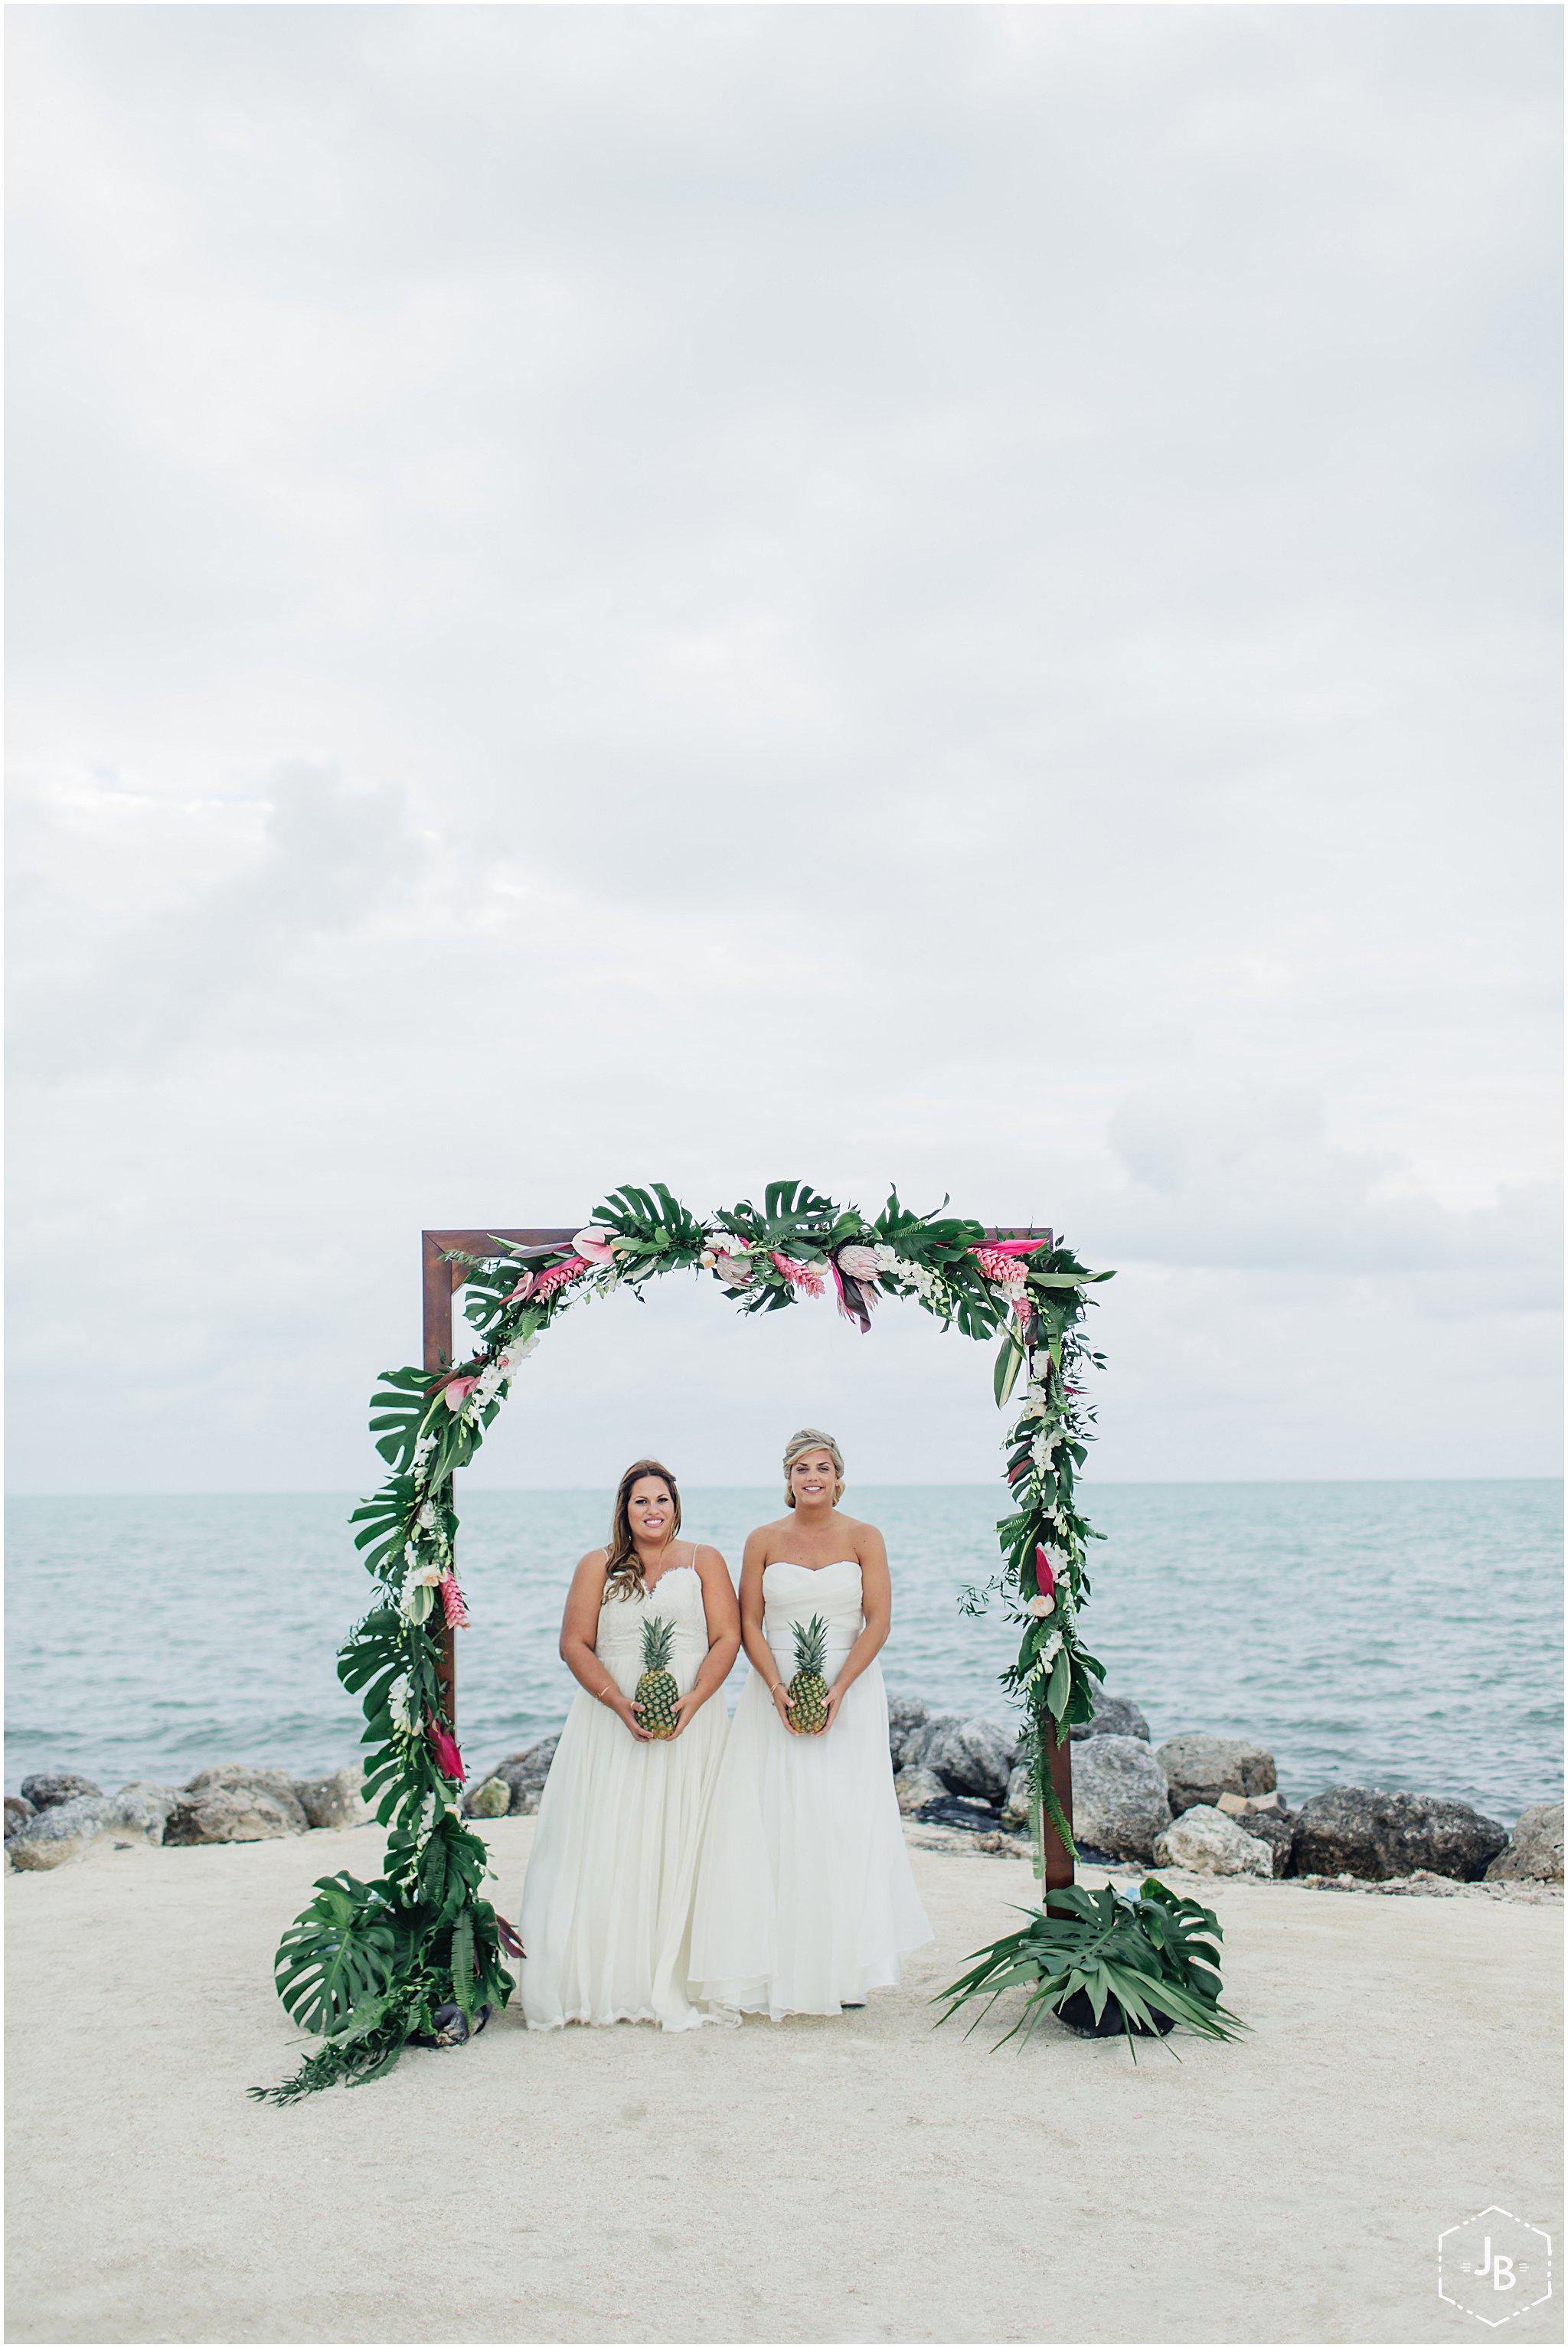 WeddingandEngagementFloridaPhotographer_1463.jpg